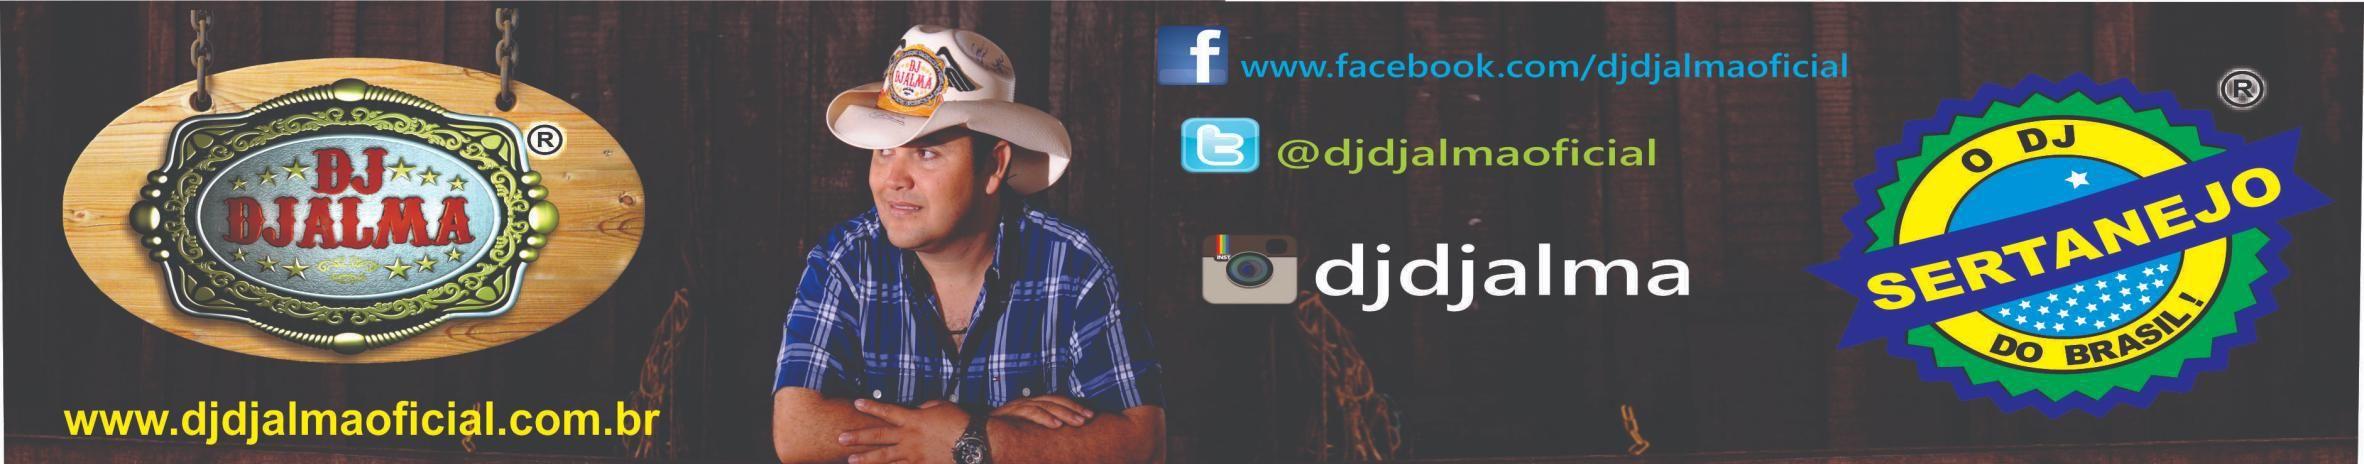 Imagem de capa de DJ  DJALMA O DJ SERTANEJO DO BRASIL